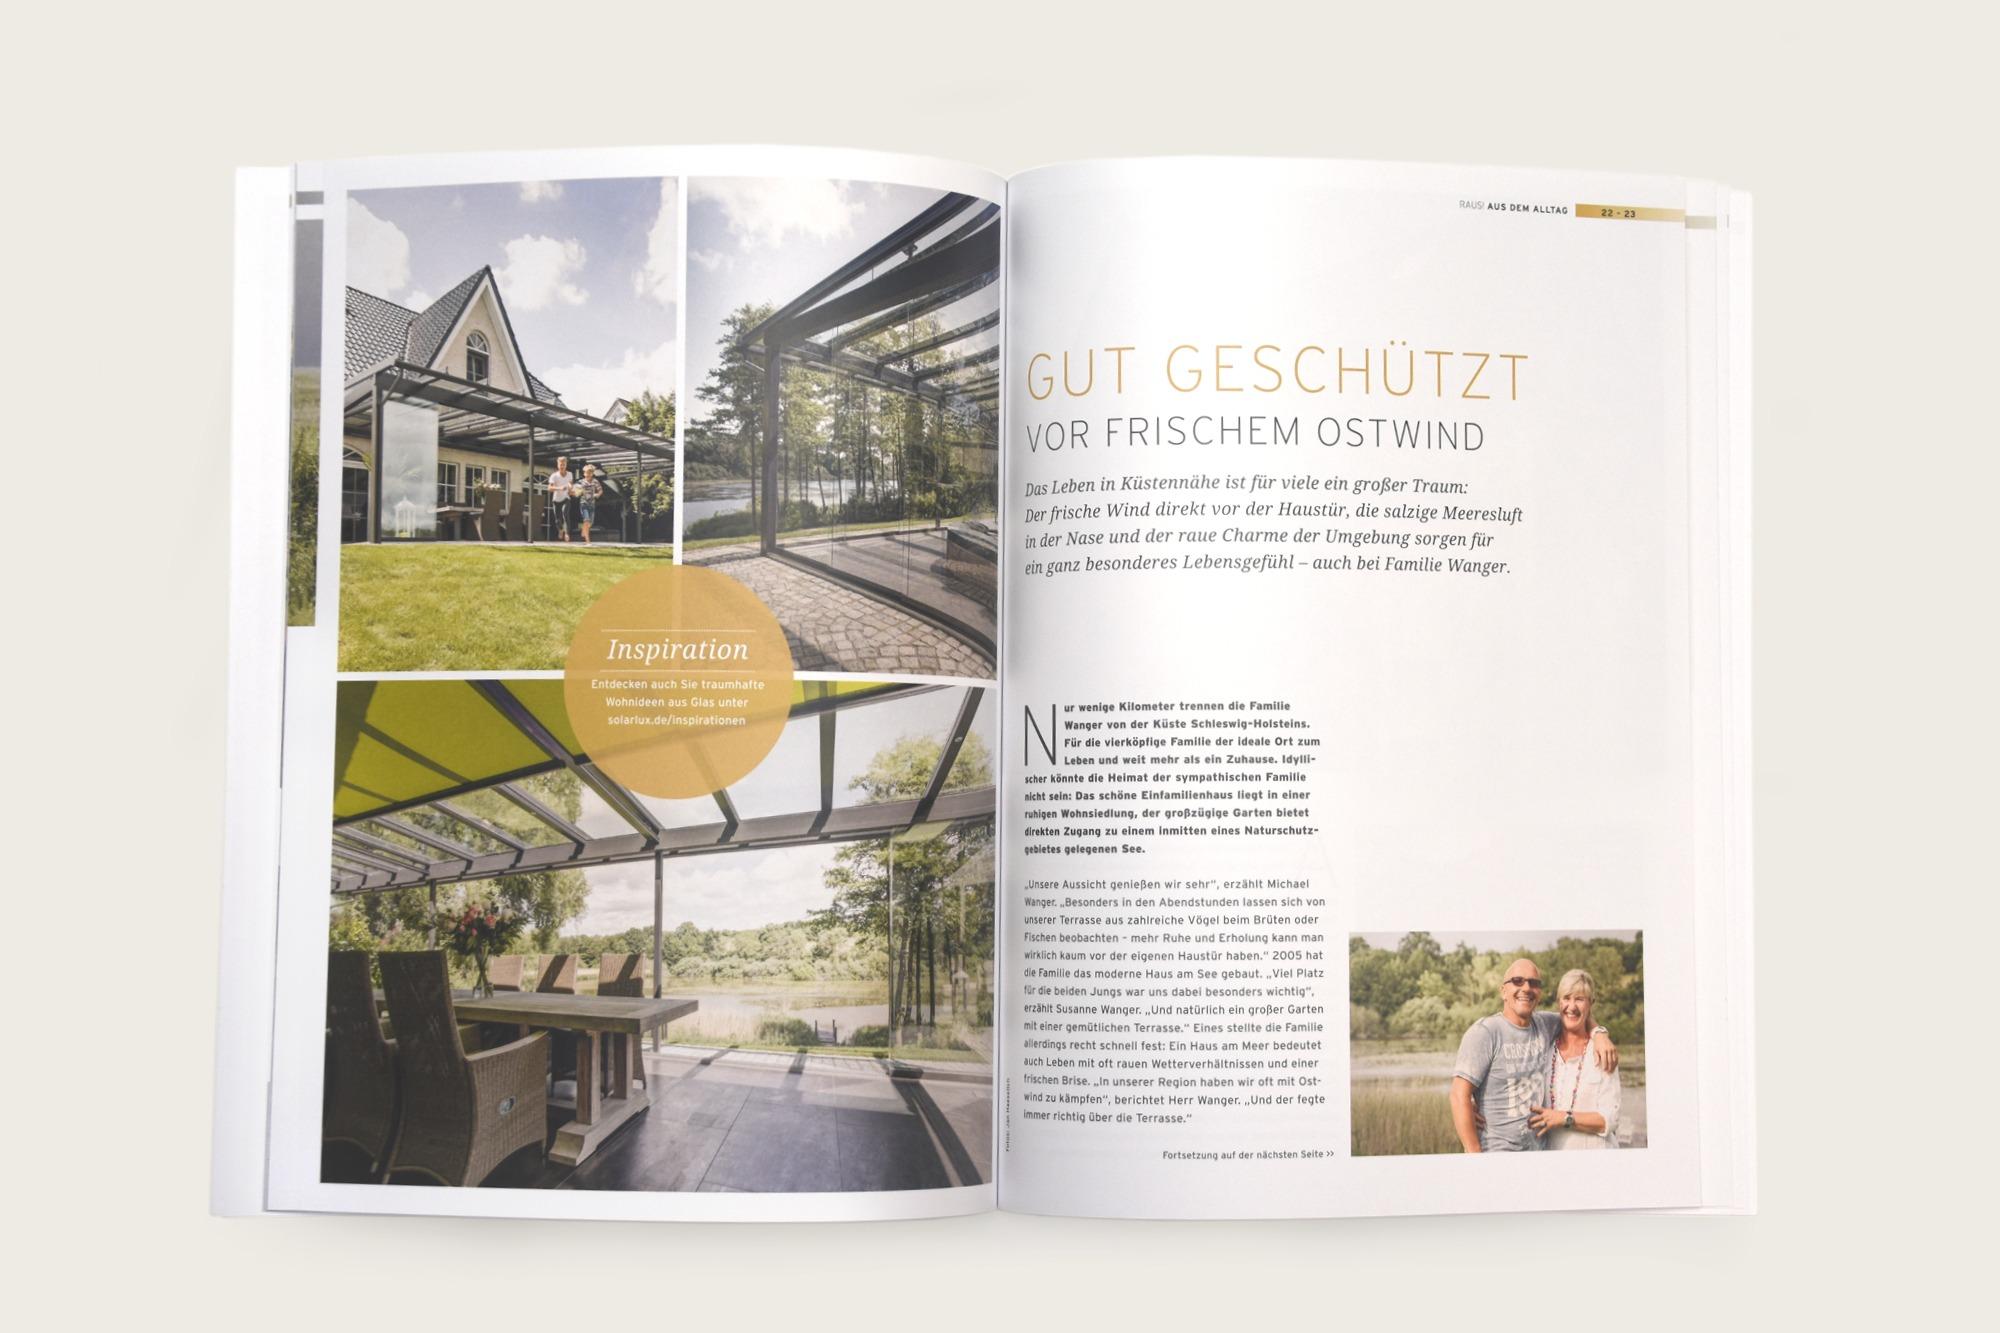 Studio dos, Grafikdesign Osnabrück, Solarlux Kundenmagazin Innenseite